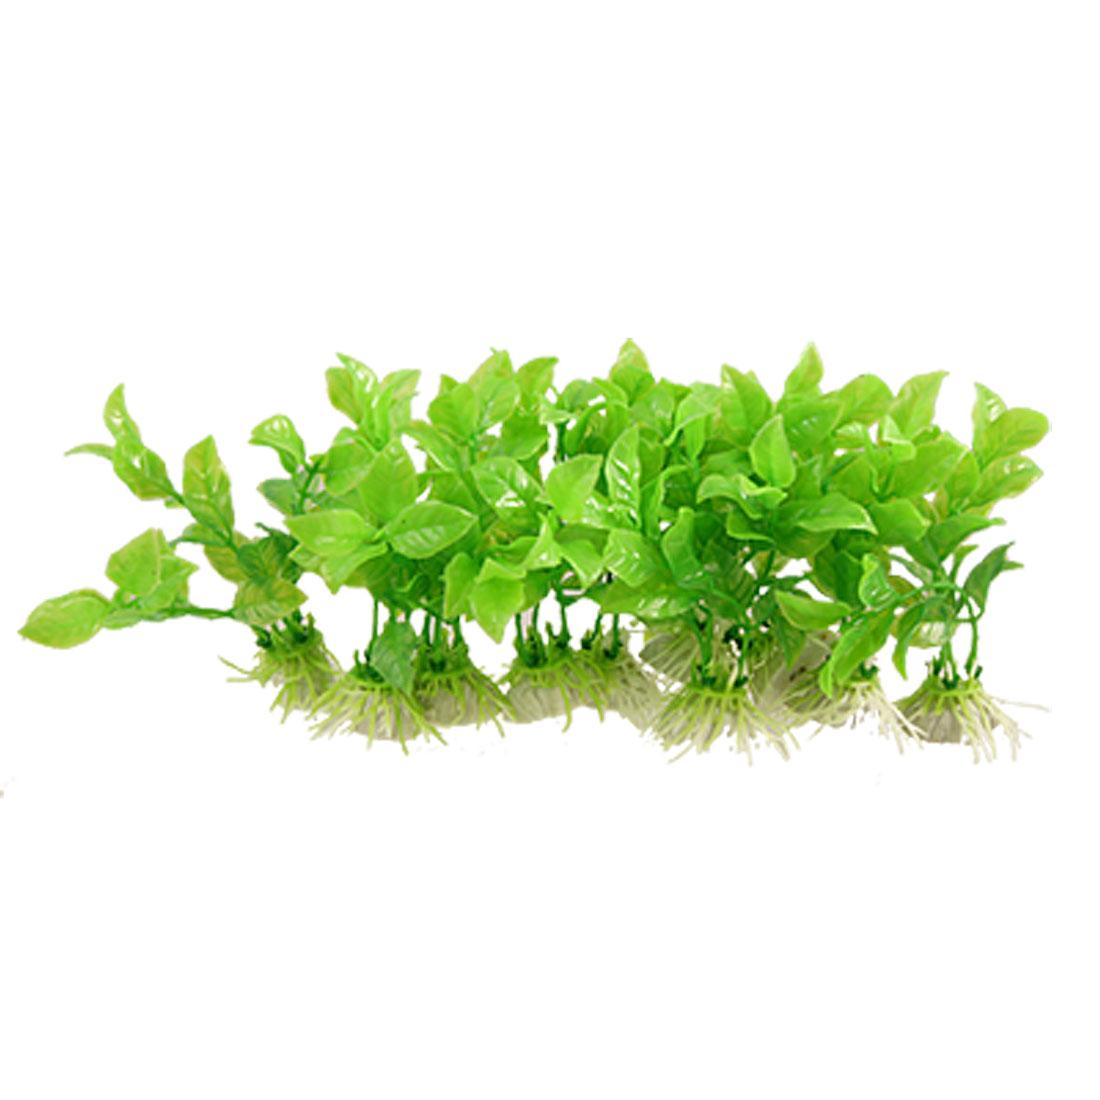 "10 Pcs 4"" Green Artificial Oval Leaves Plastic Aquatic Plants for Fish Tank"